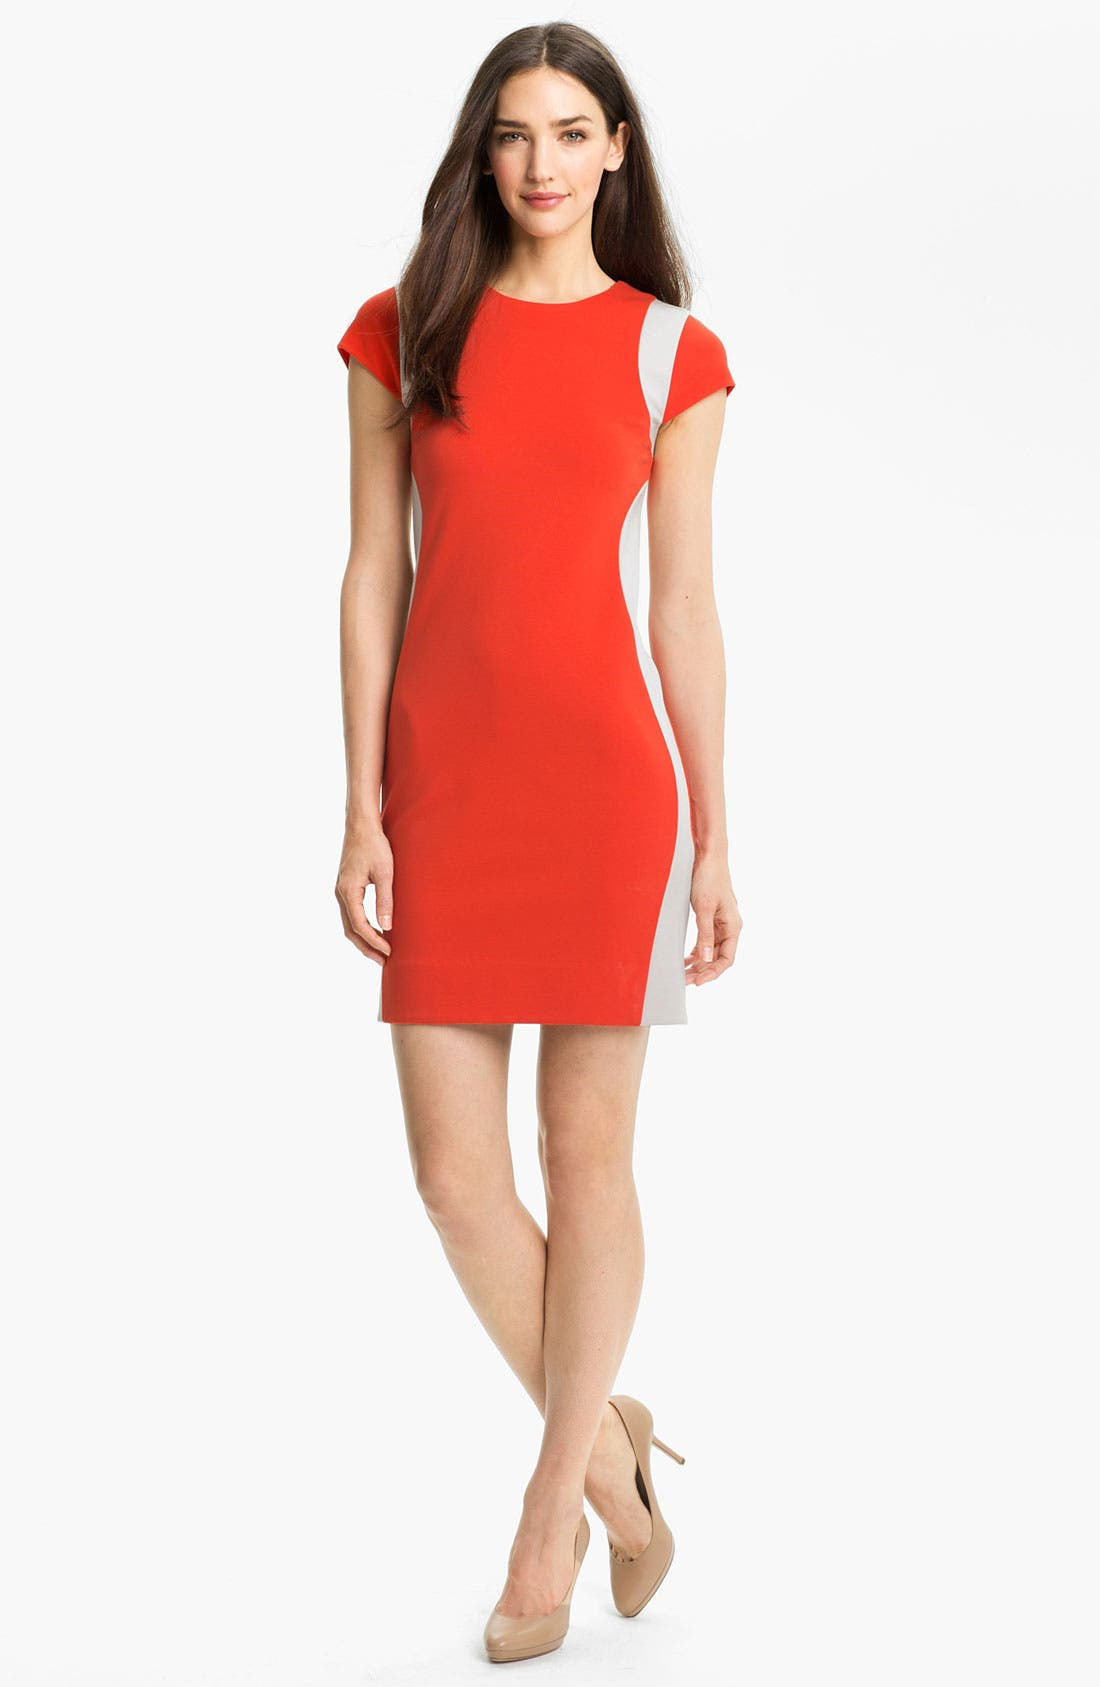 Alternate Image 1 Selected - Diane von Furstenberg 'Pele' Knit Sheath Dress